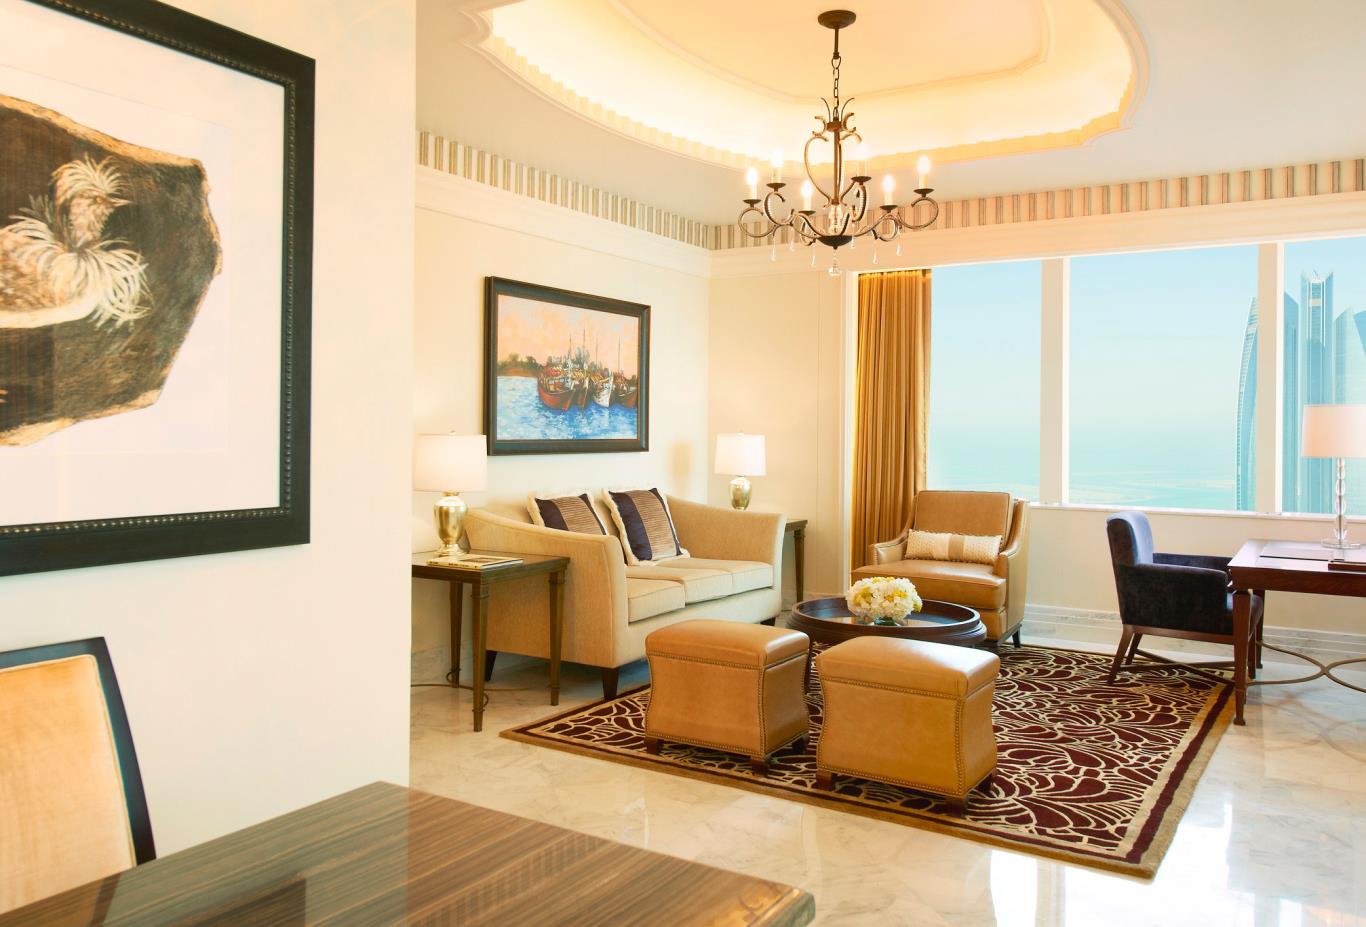 St Regis Suite living room